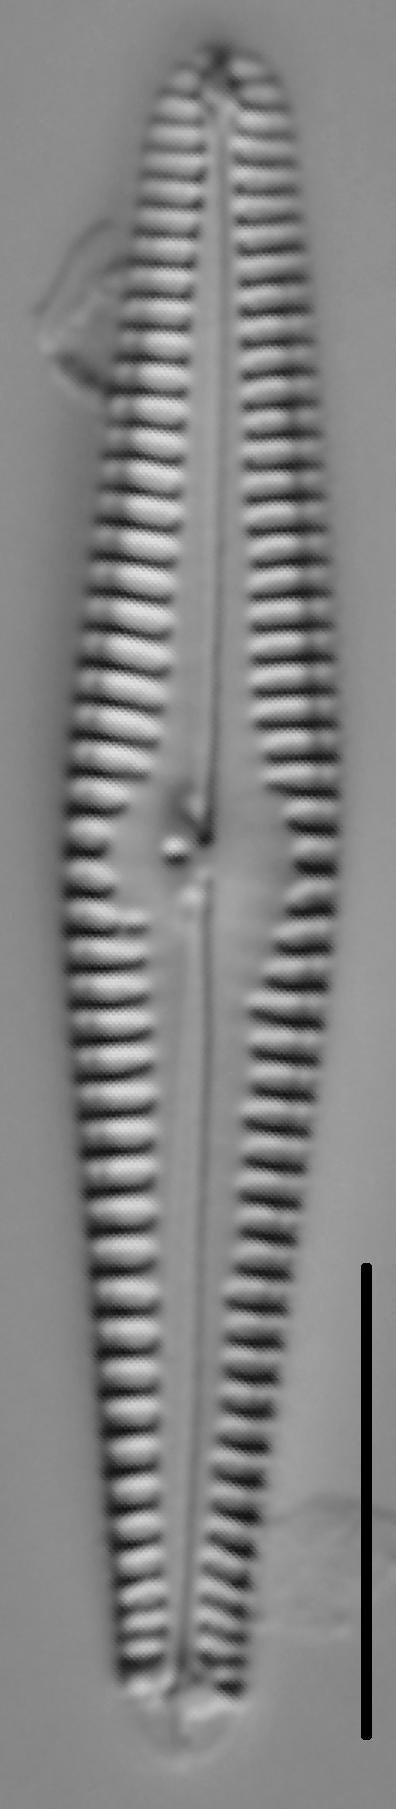 Gomphonema stoermeri LM2